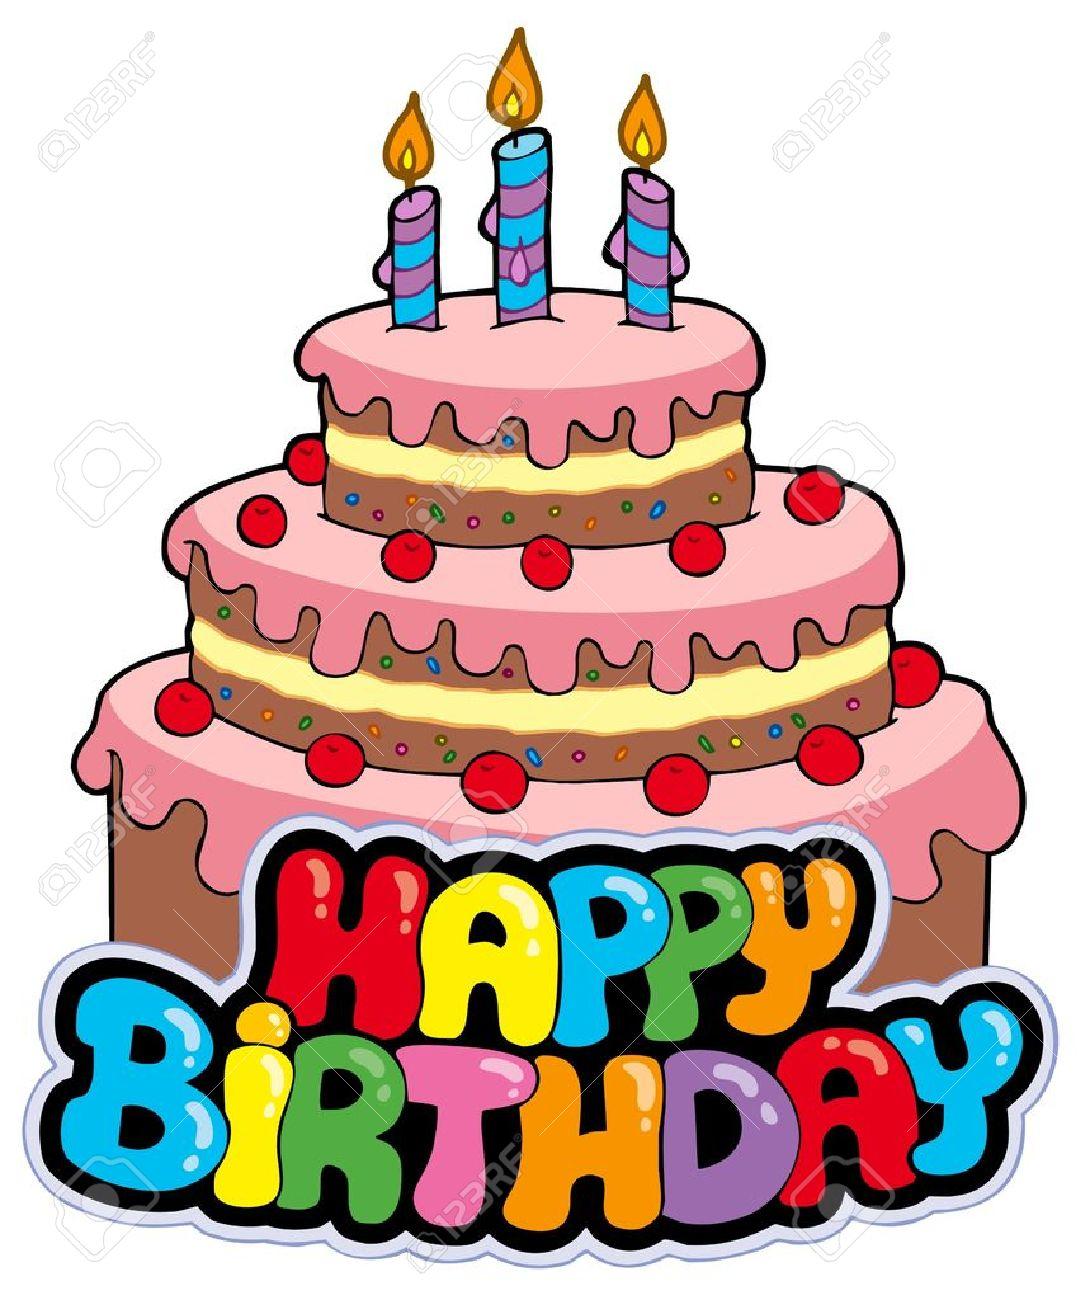 Happy birthday cake clipart 4 » Clipart Station.